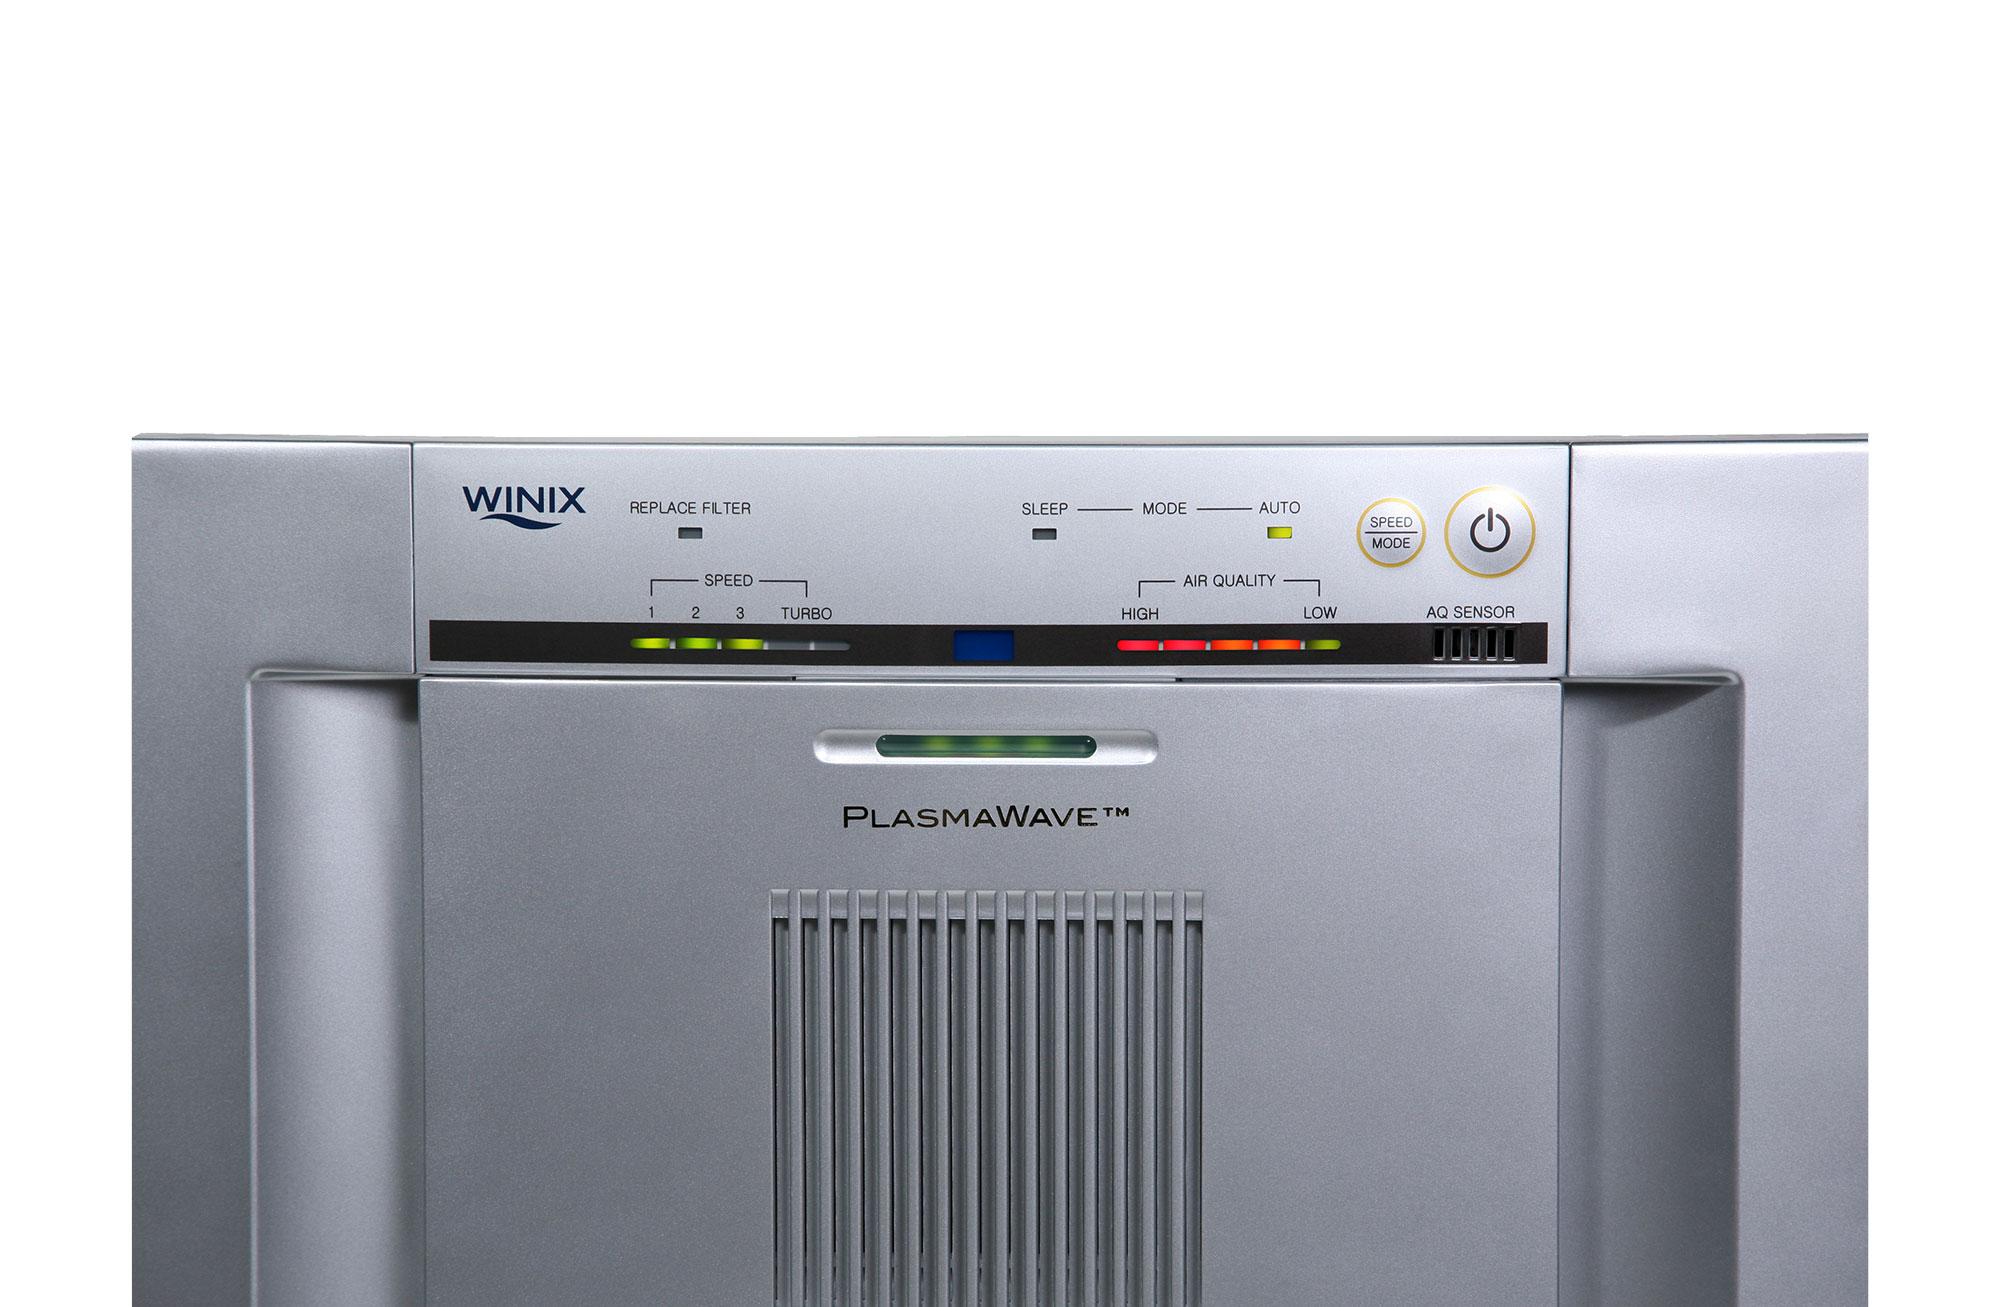 winix plasmawave 5300 2 manual